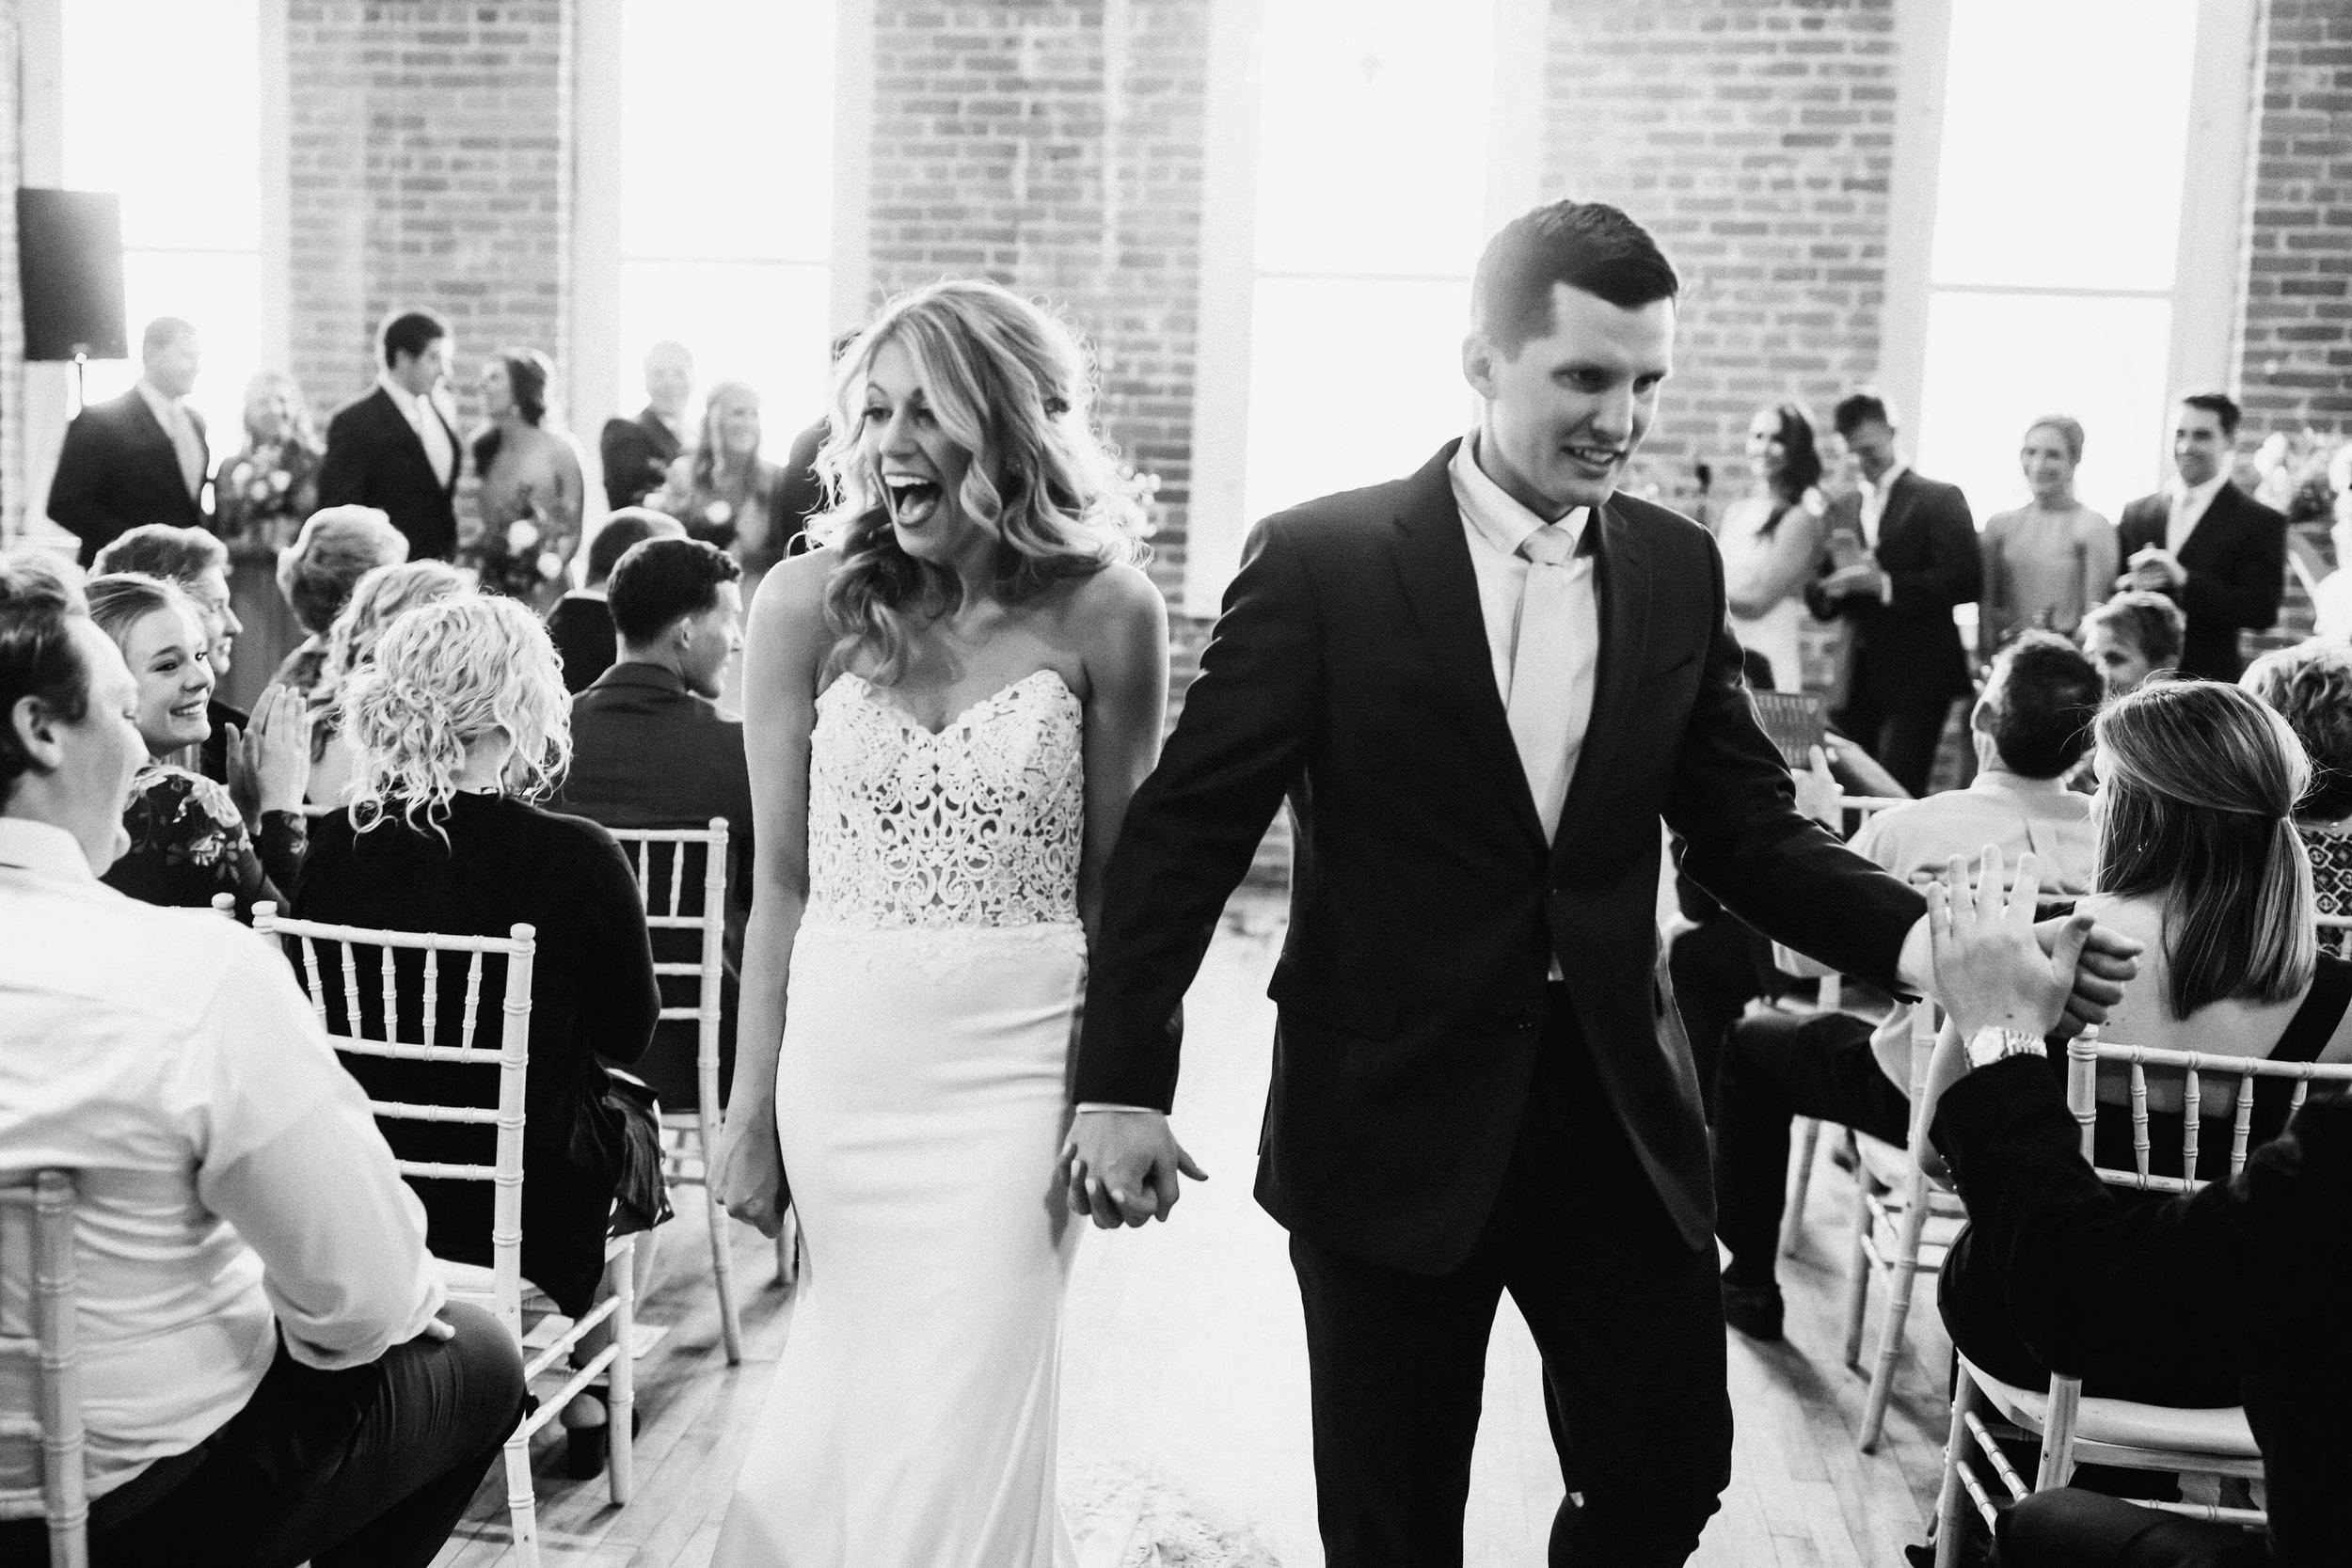 engle-olson-ashley-schyler-wedding-matt-lien-photography-4.jpg